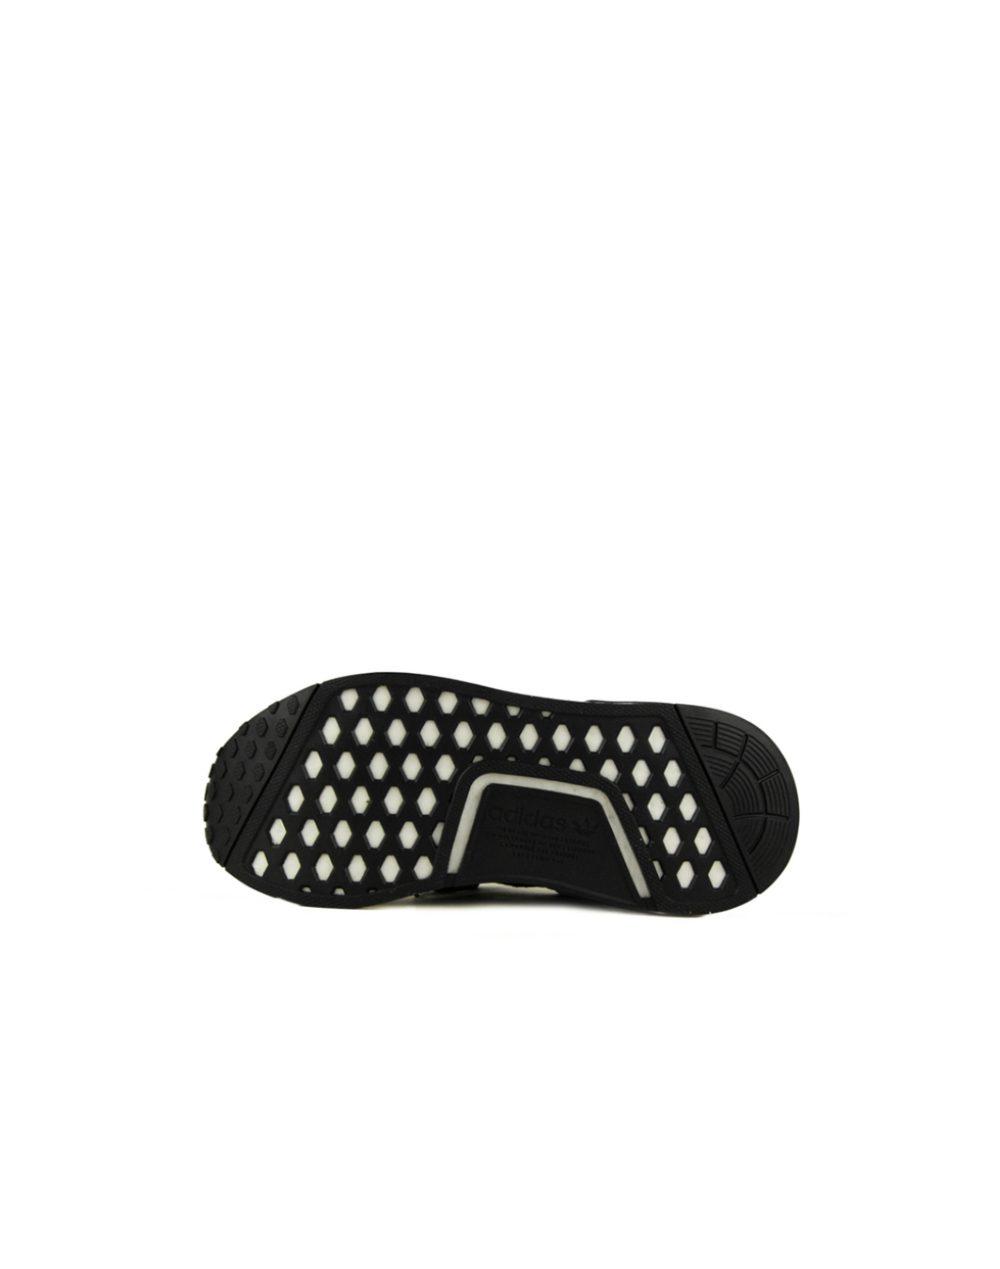 separation shoes 278ed e4523 Adidas NMD_R1 Black (B37649) | Eleven